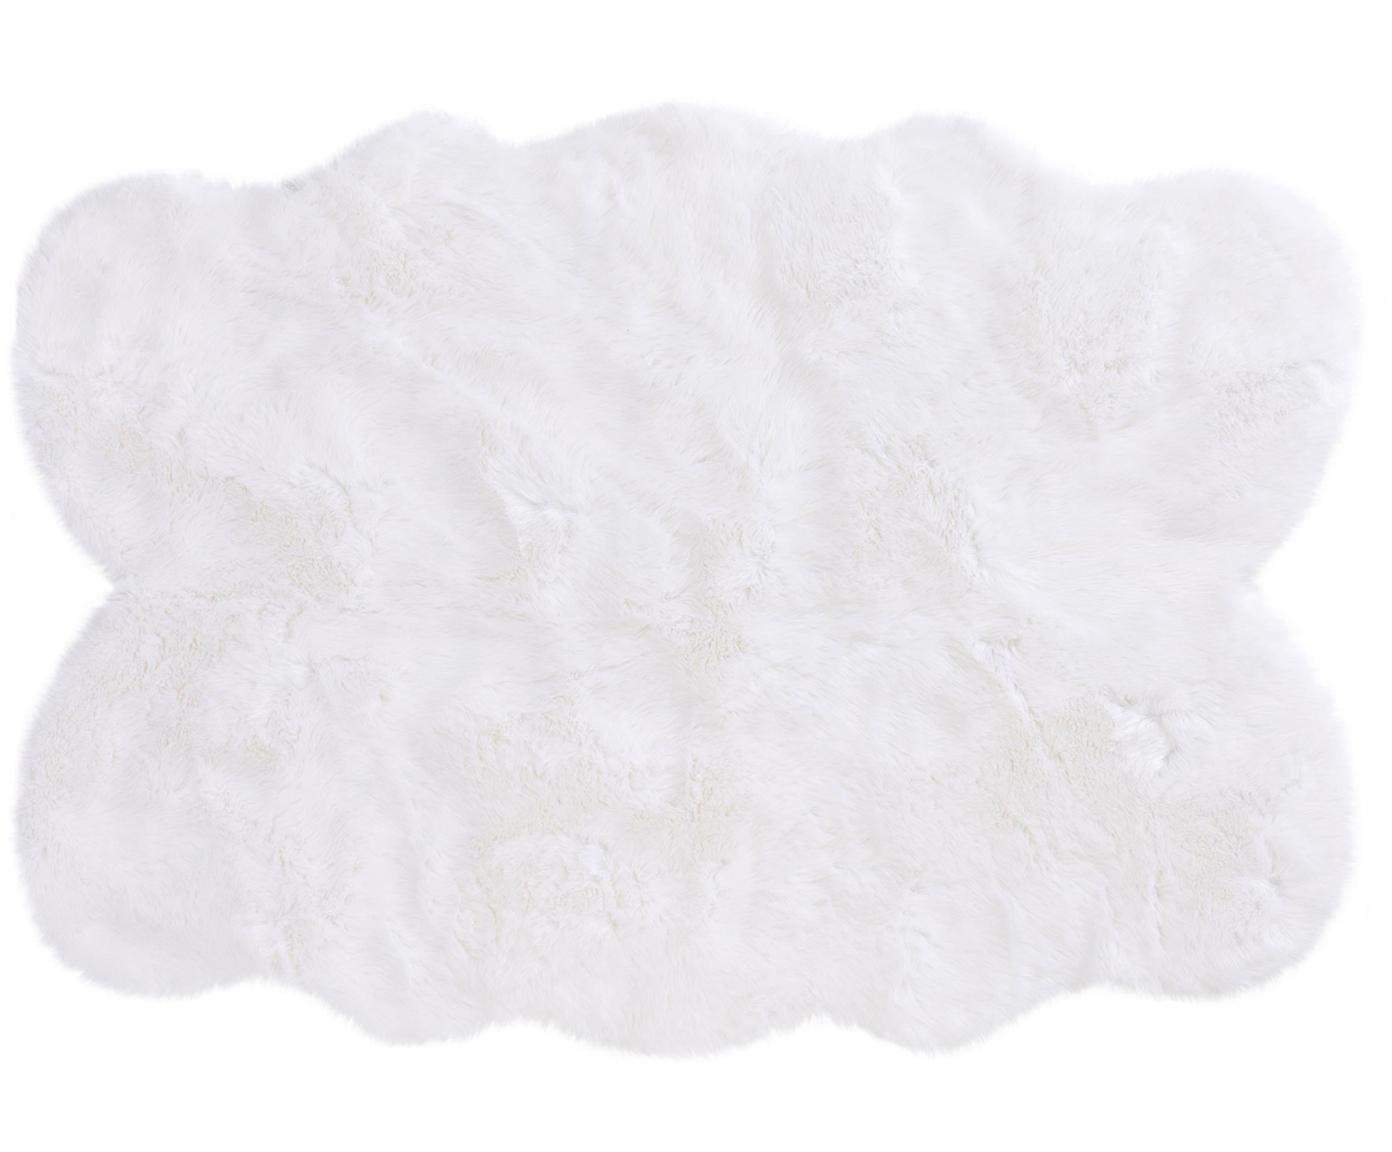 Alfombra piel sintética Elmo, Parte superior: 50%acrílico, 50%poliést, Reverso: poliéster, Blanco, An 140 x L 200 cm (Tamaño S)